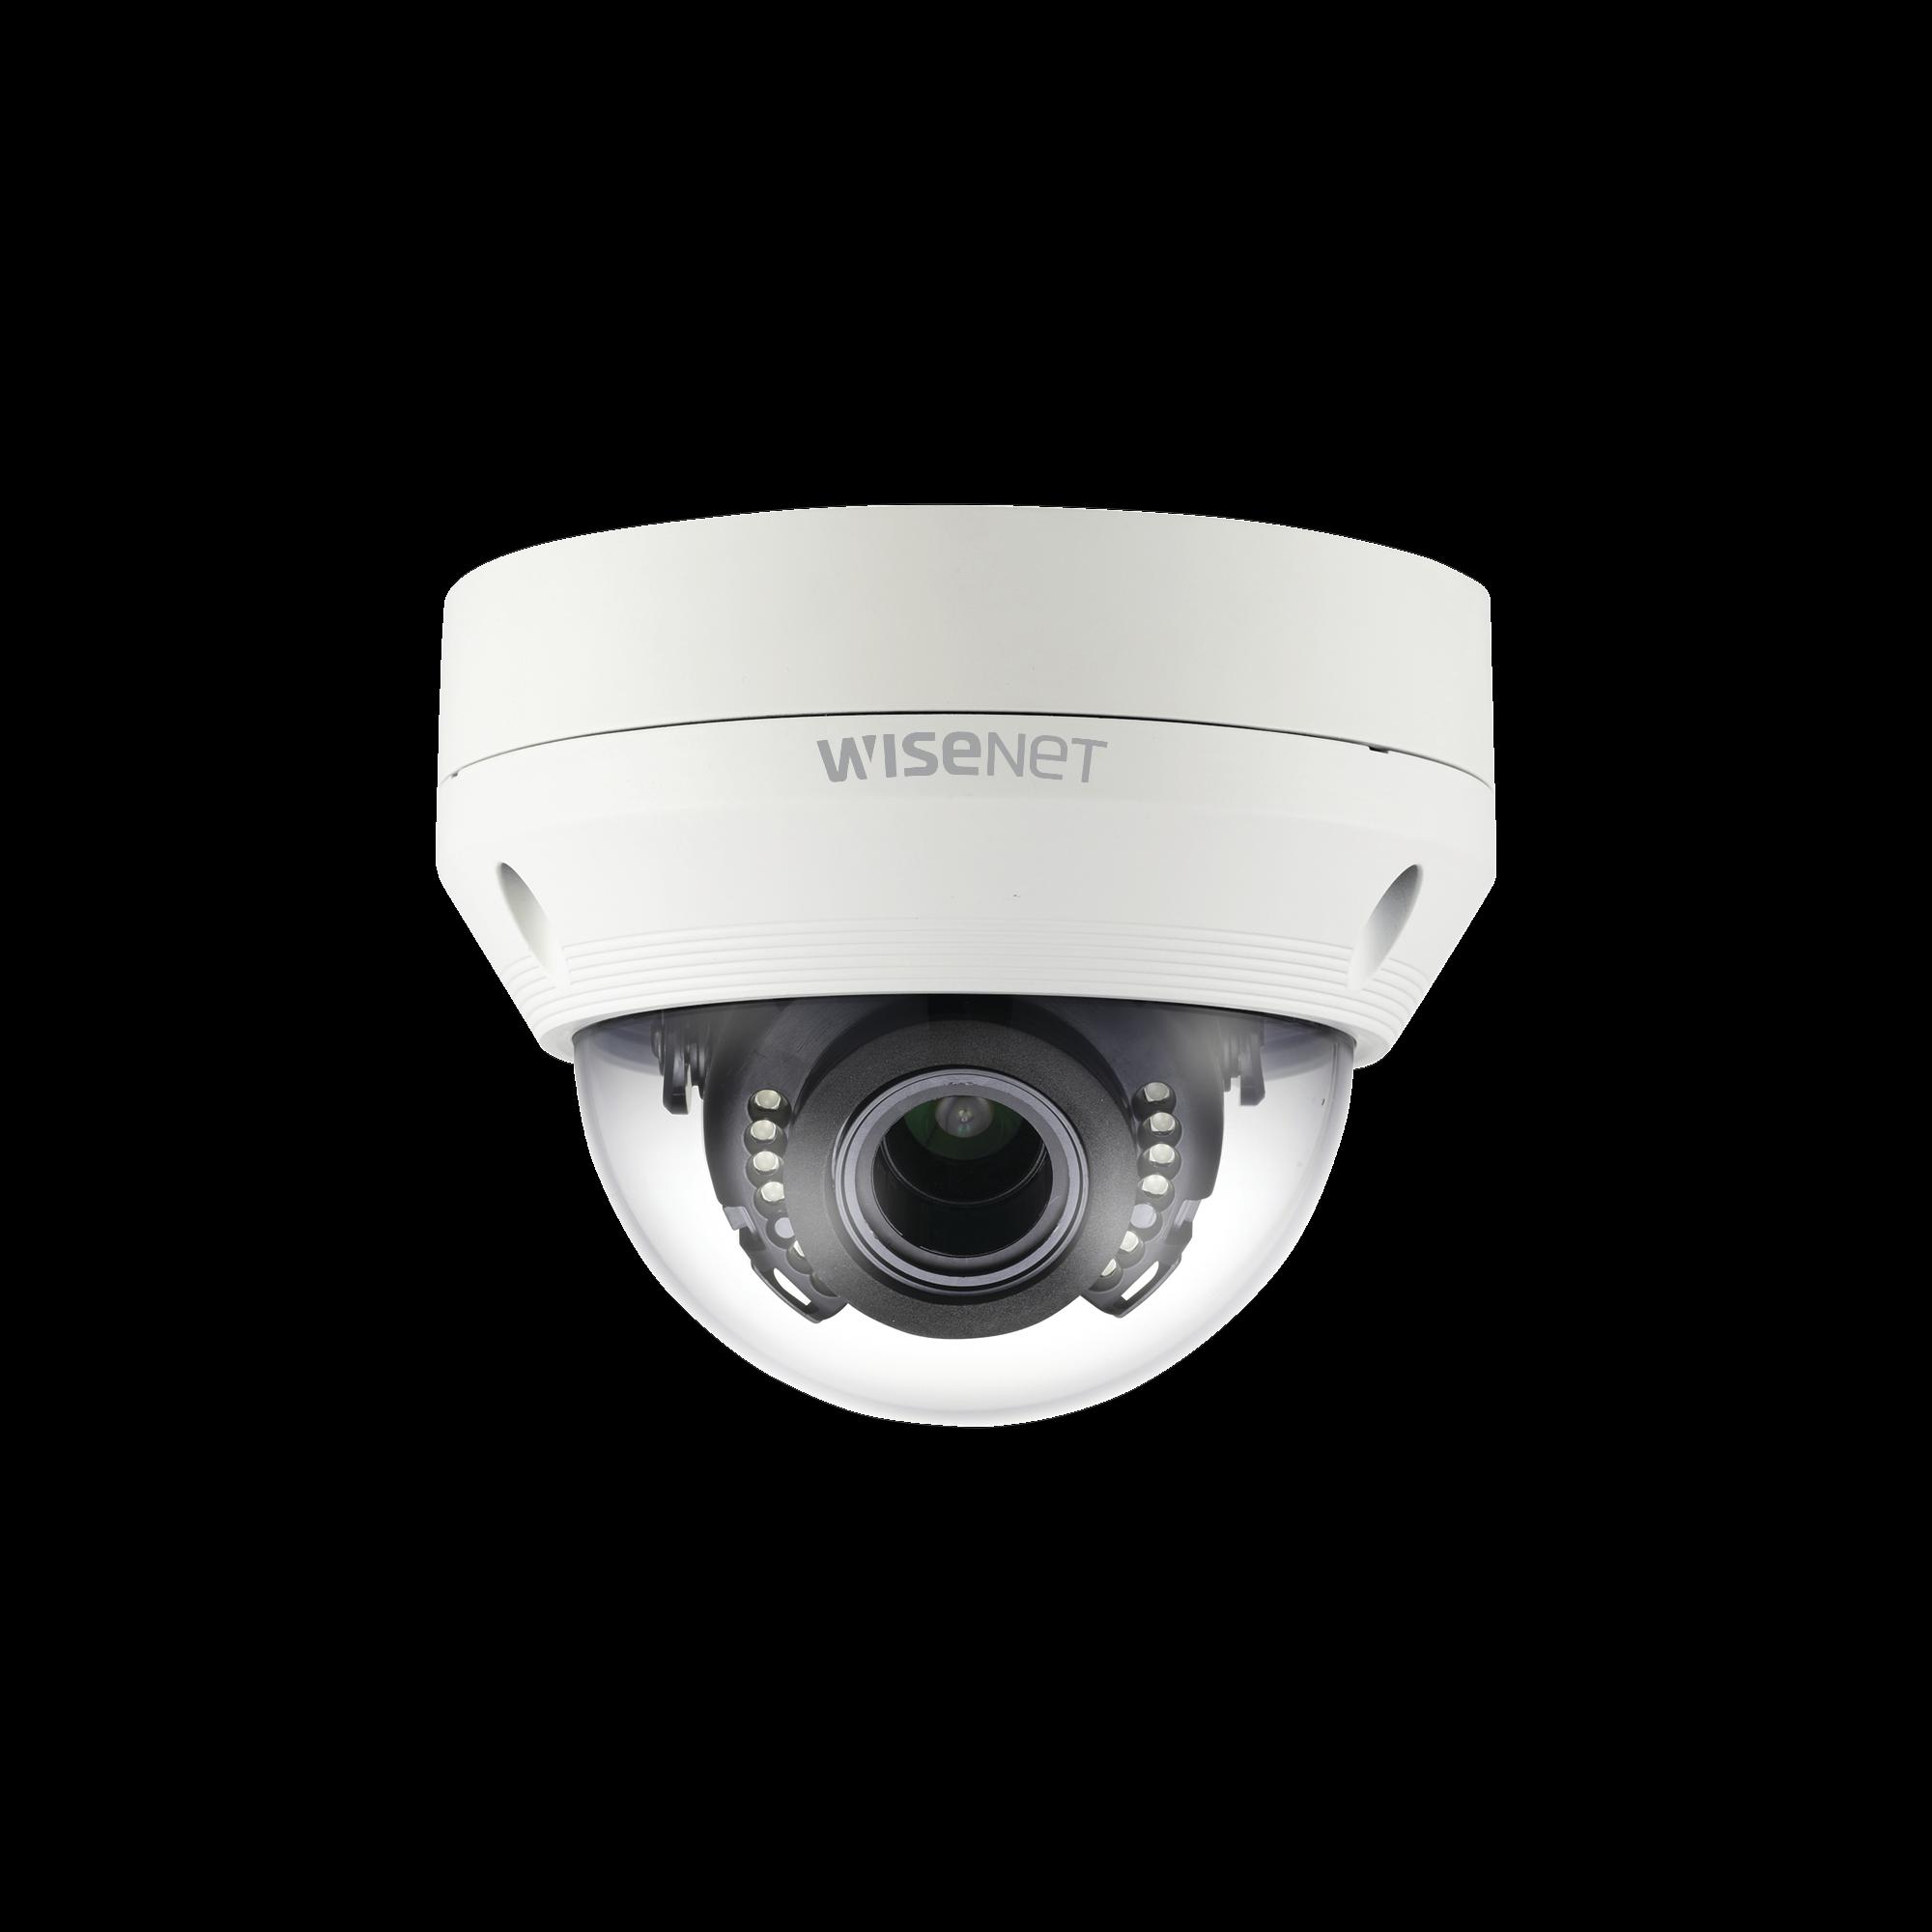 Cámara Domo AHD Híbrida Antivandálica 1080p / Lente Varifocal 2.8 - 12mm / IR 30M / dWDR / IP66